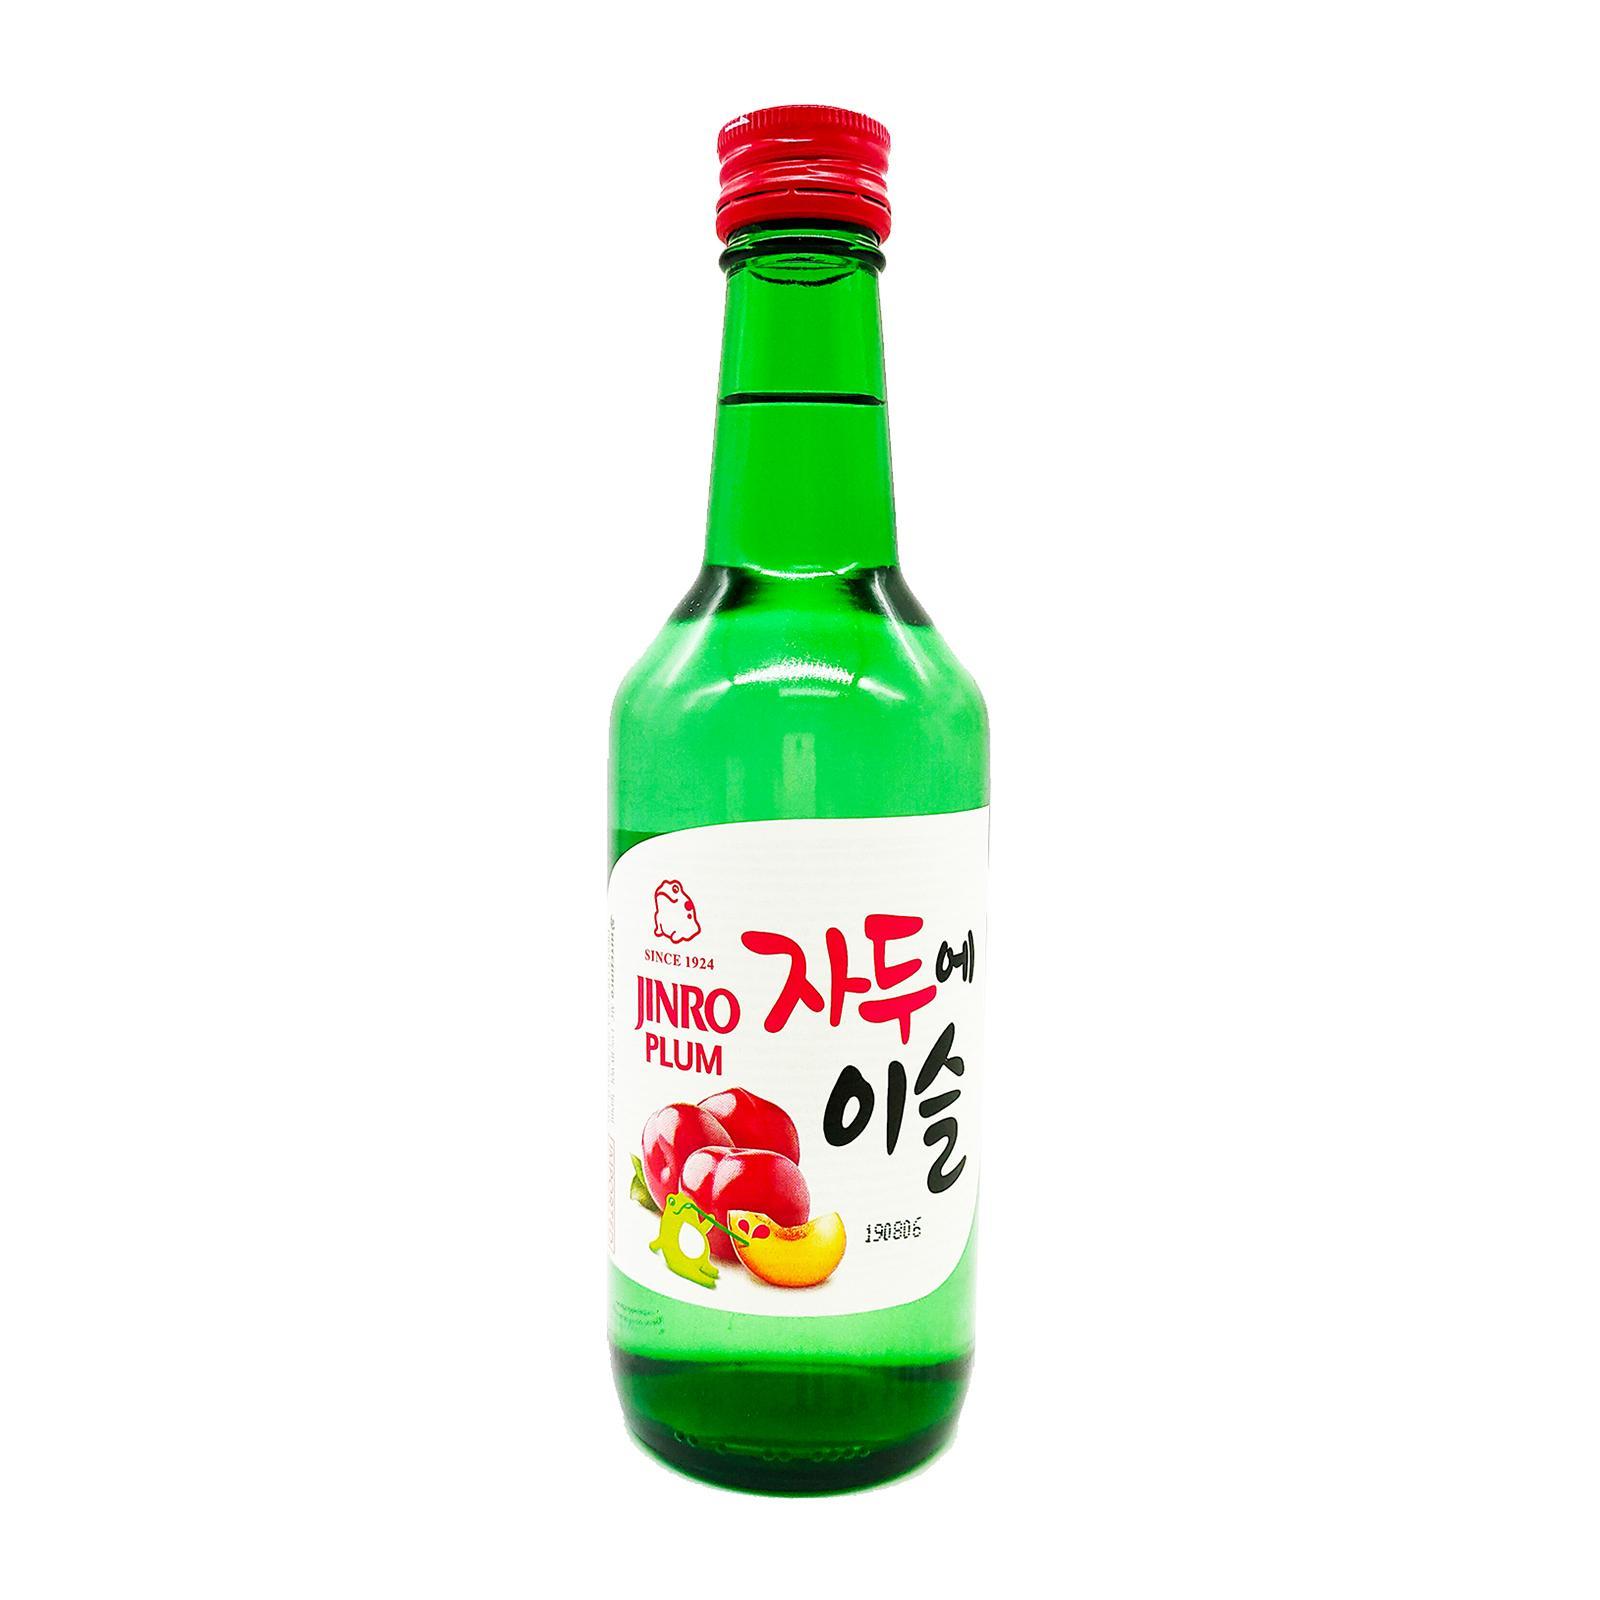 Jinro Plum 360ml Bottle Soju